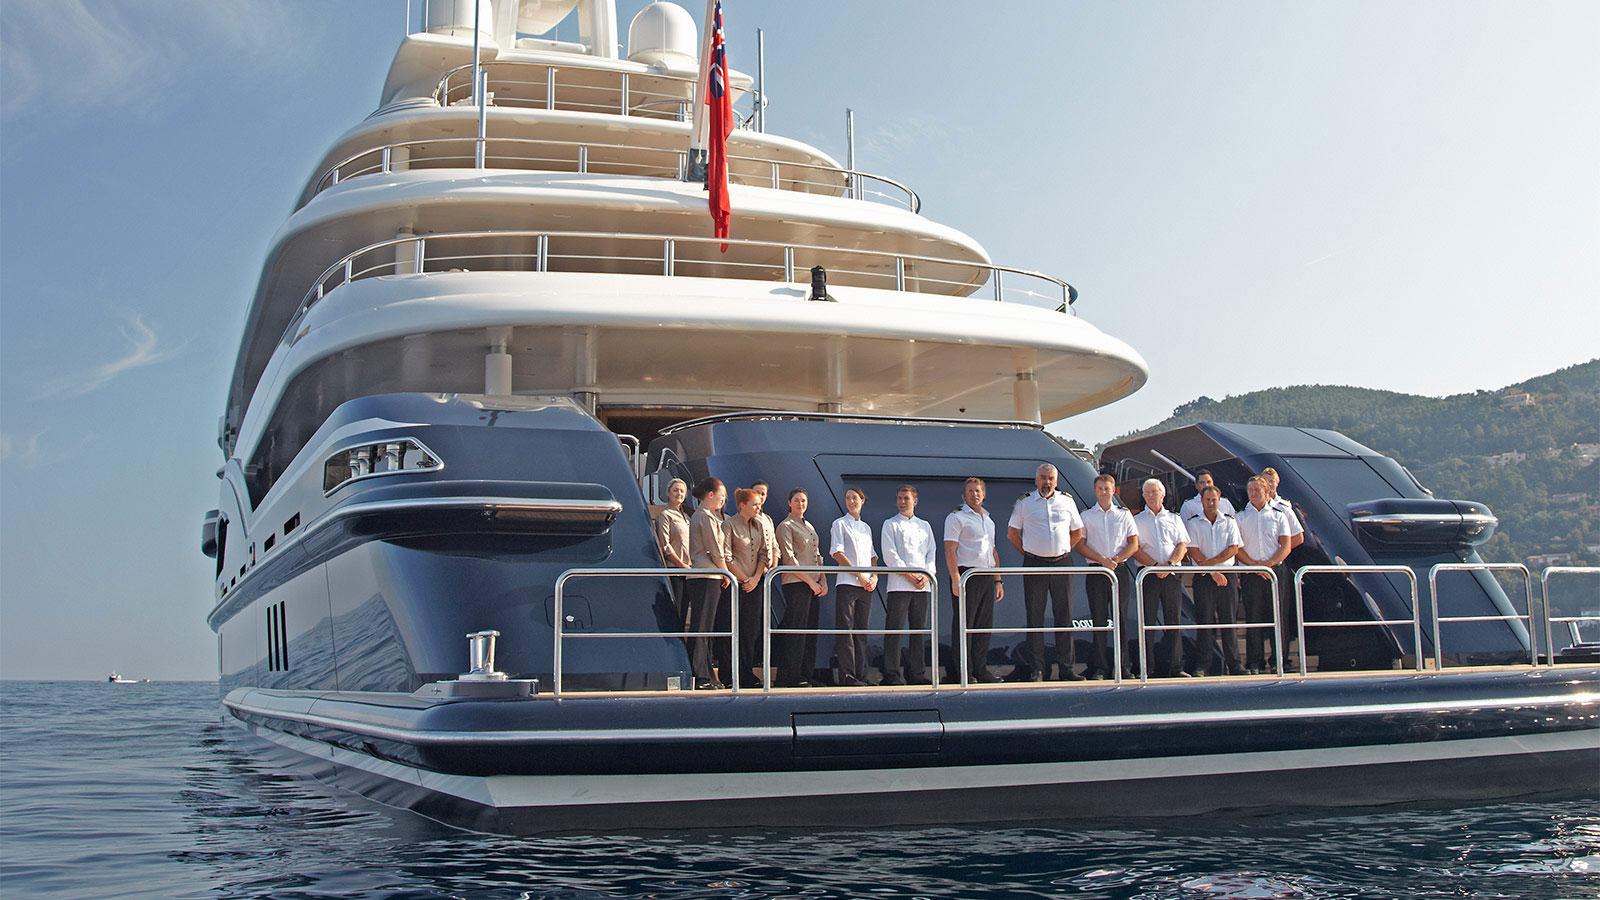 yachting mlc 2006